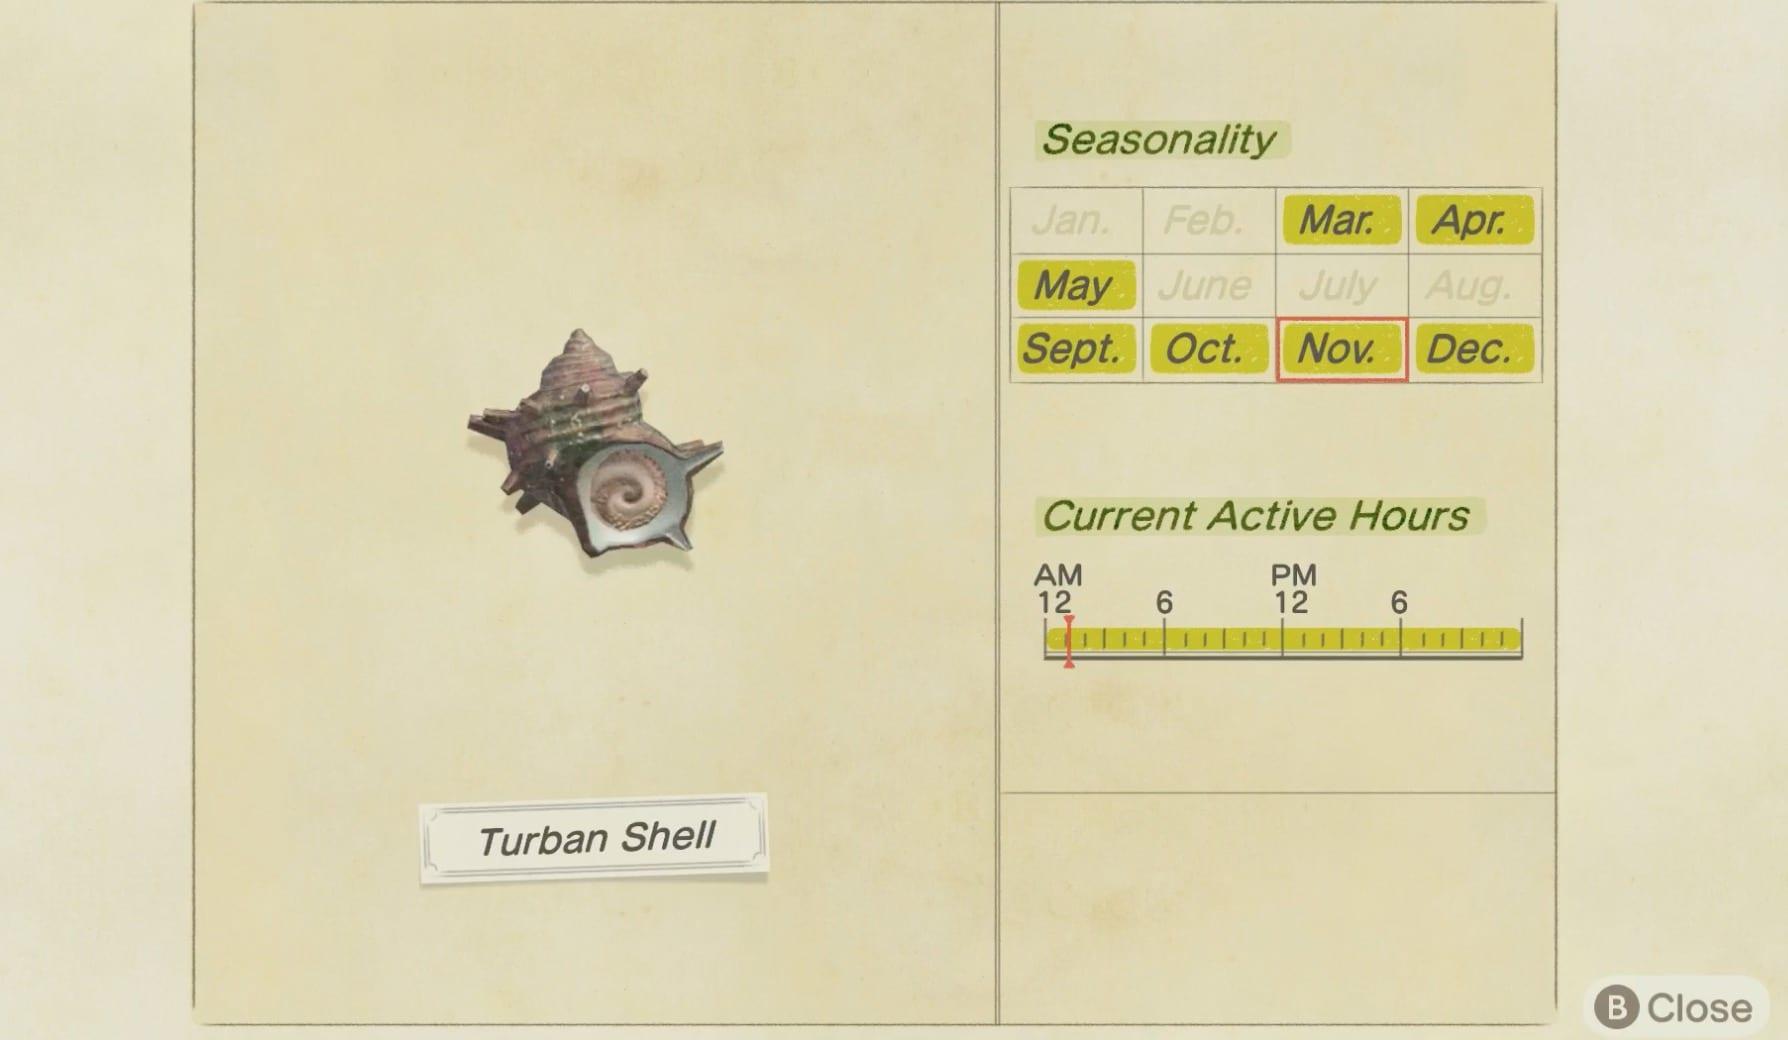 Concha de turbante, animal que cruza nuevos horizontes